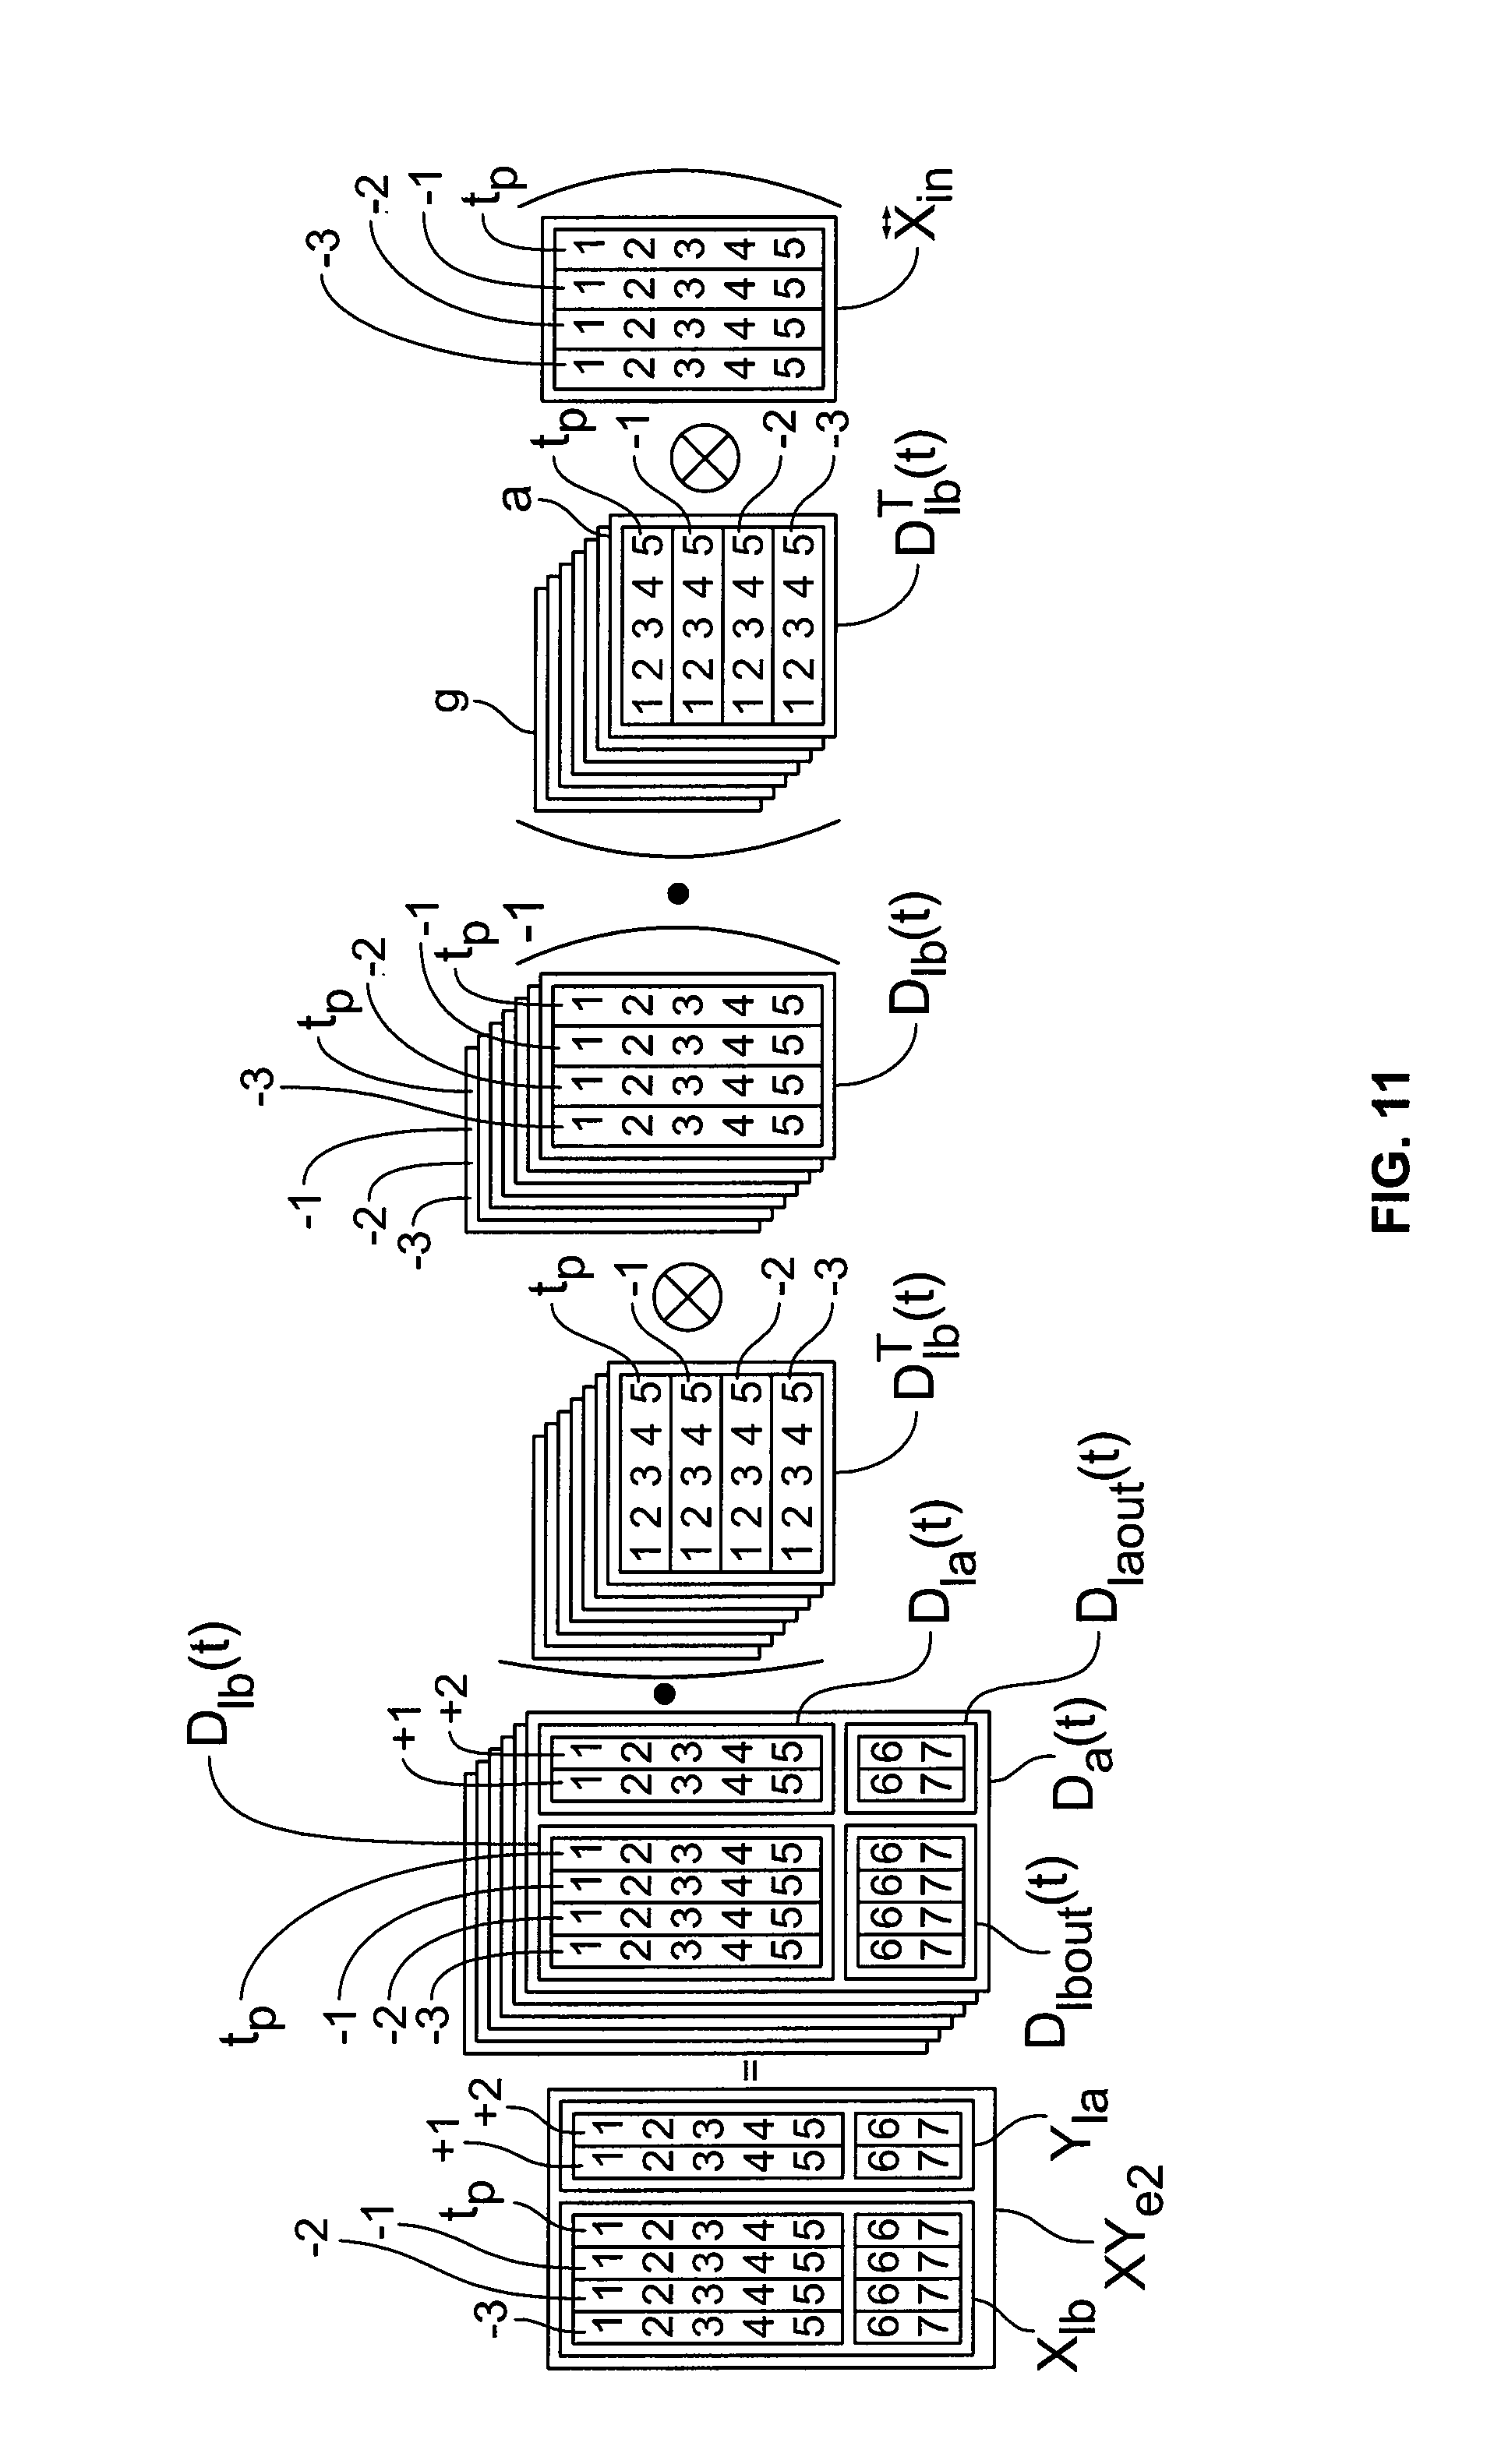 Patent Us8620853 Monitoring Method Using Kernel Regression Twozone Burglar Alarm Circuit Description Drawing